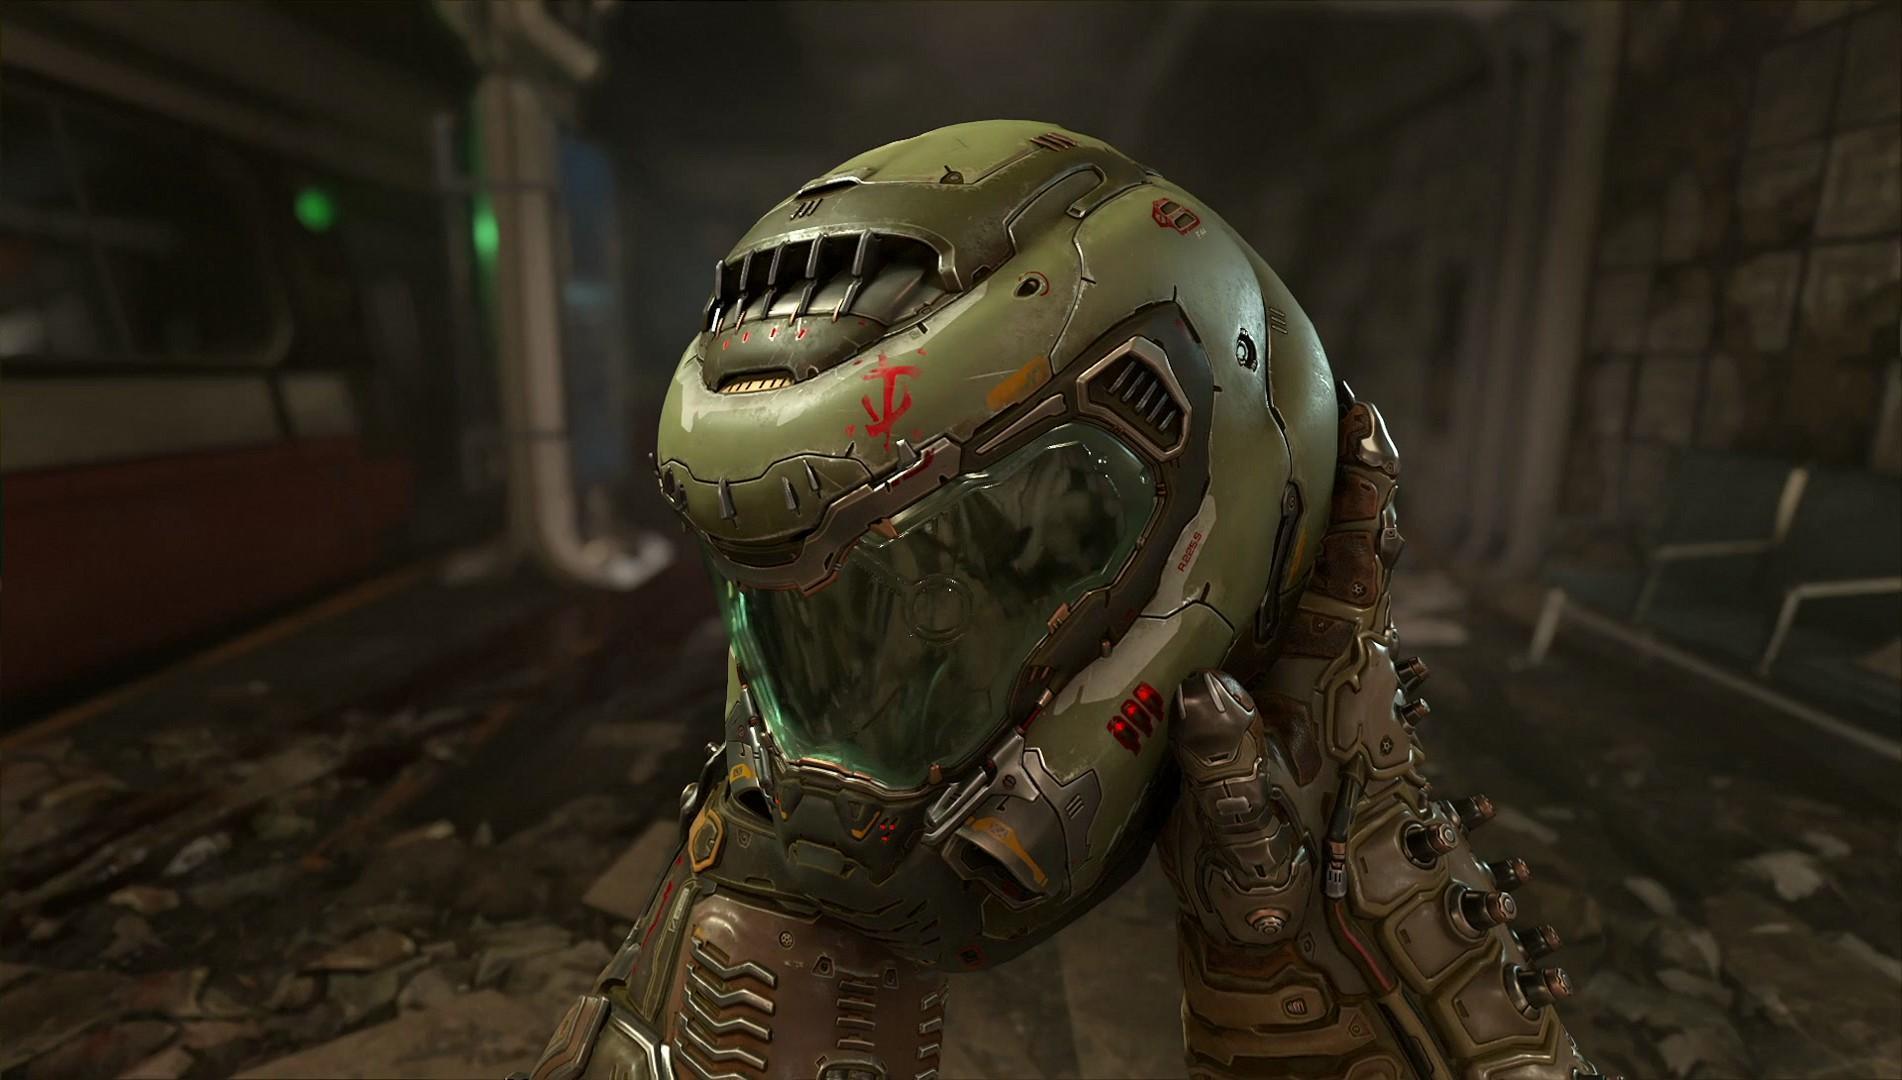 Doom Eternal S Brutal Gameplay Revealed At Quakecon 2018 Slashgear